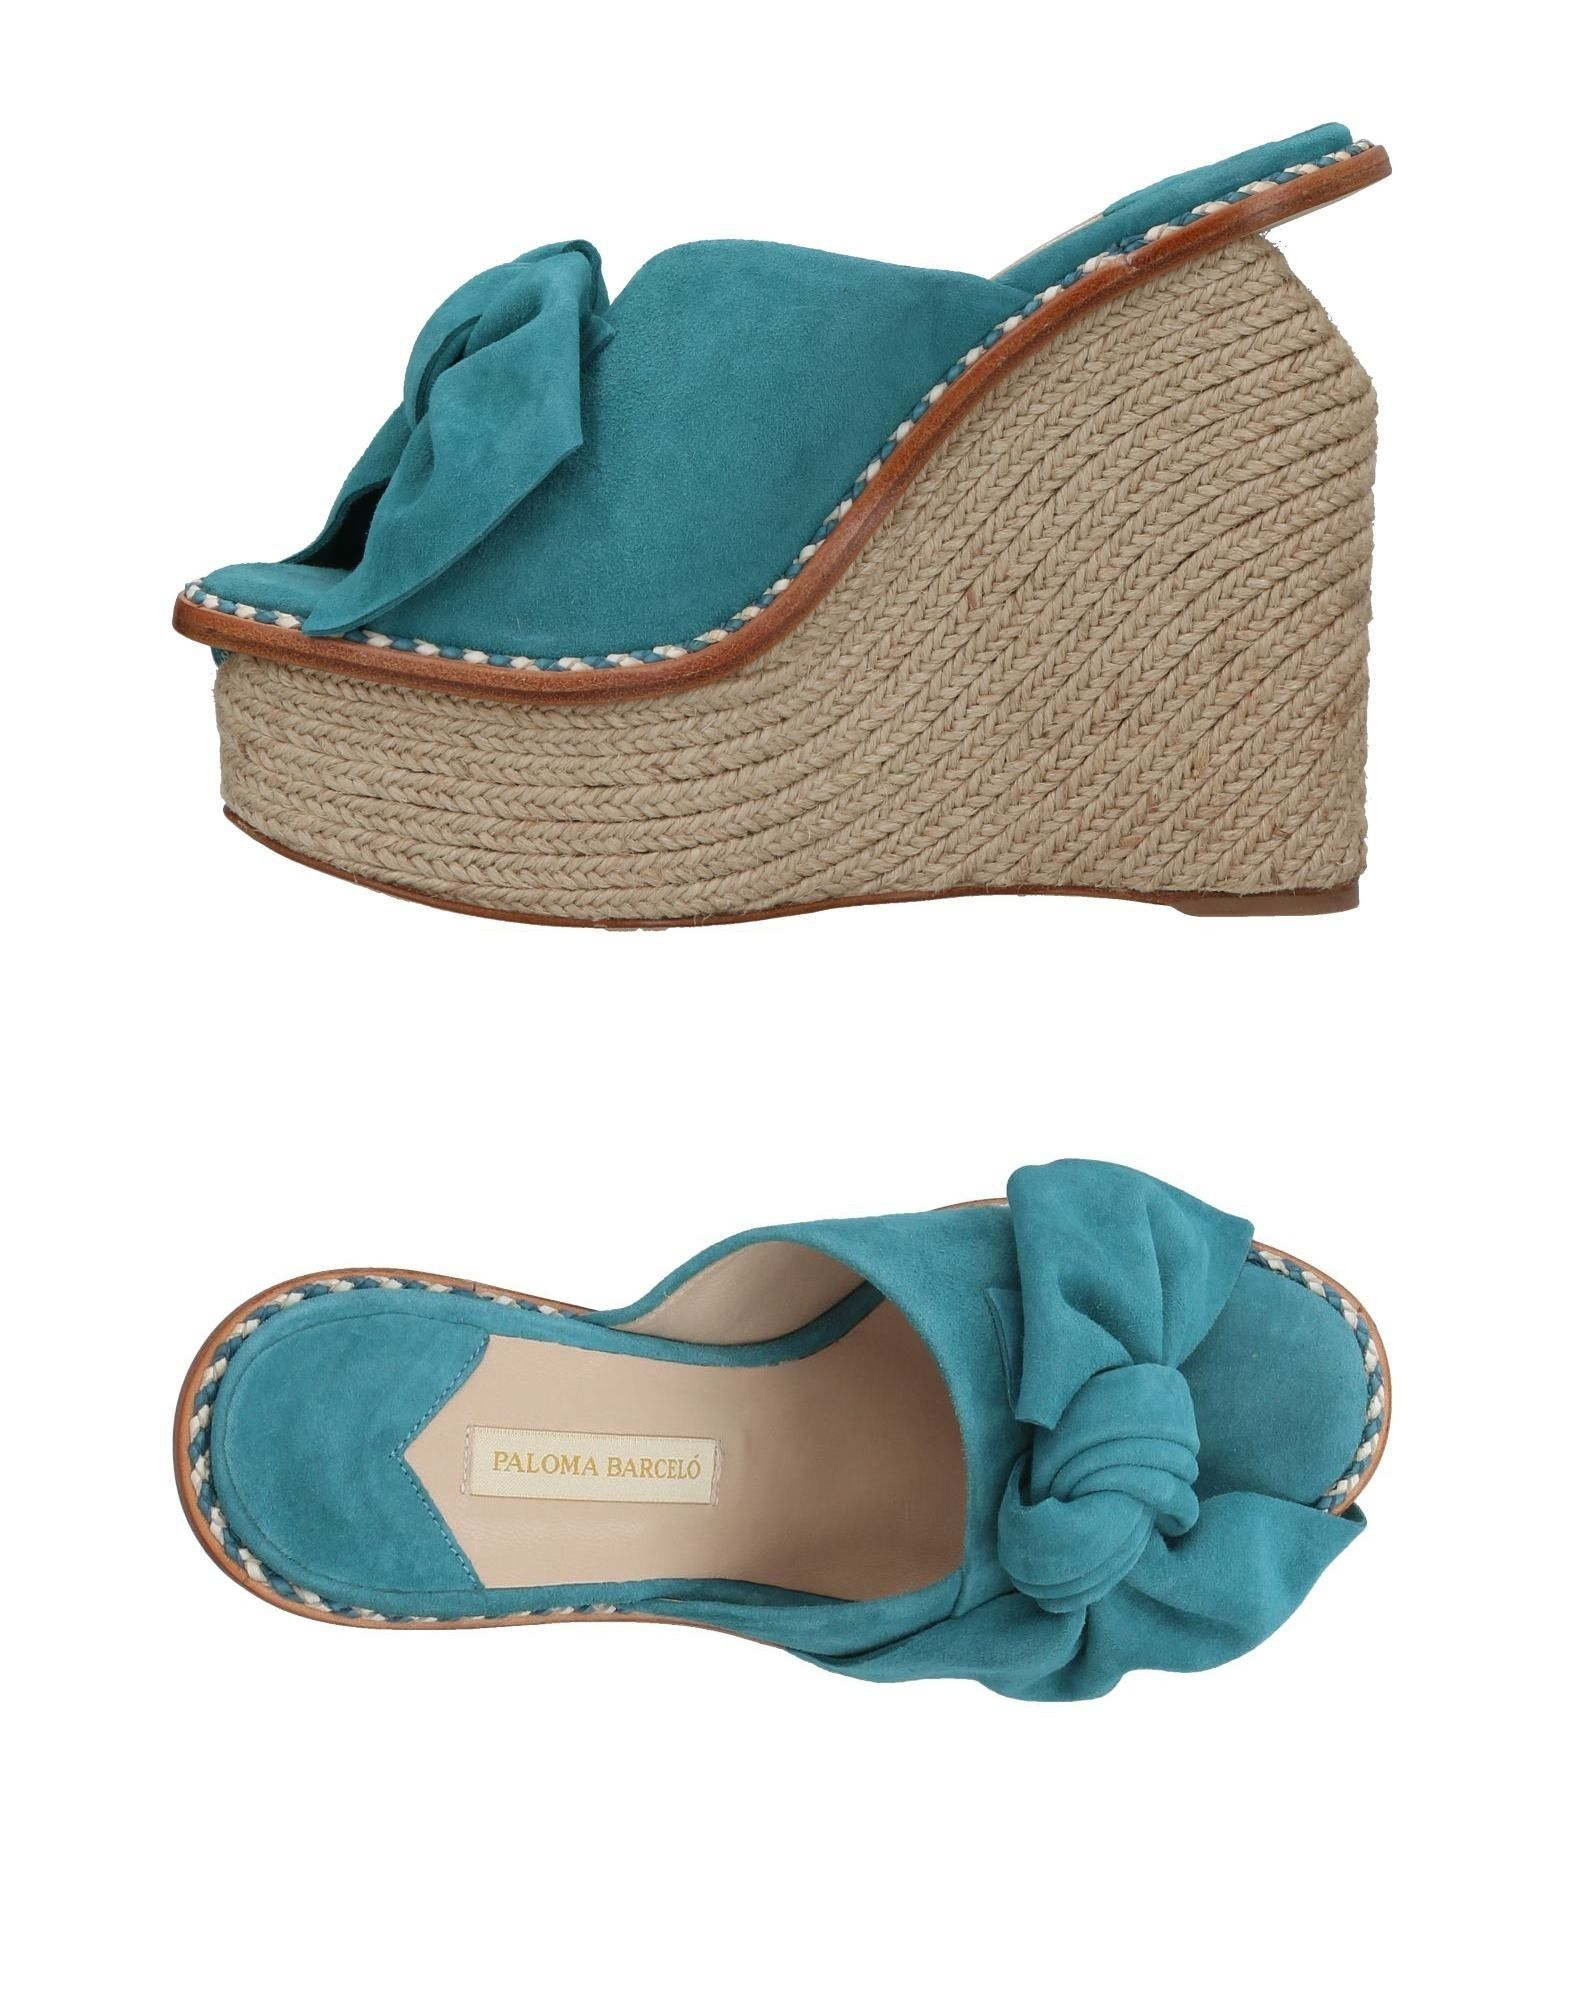 Paloma Barceló Sandalen Damen  11383875REGut aussehende strapazierfähige Schuhe